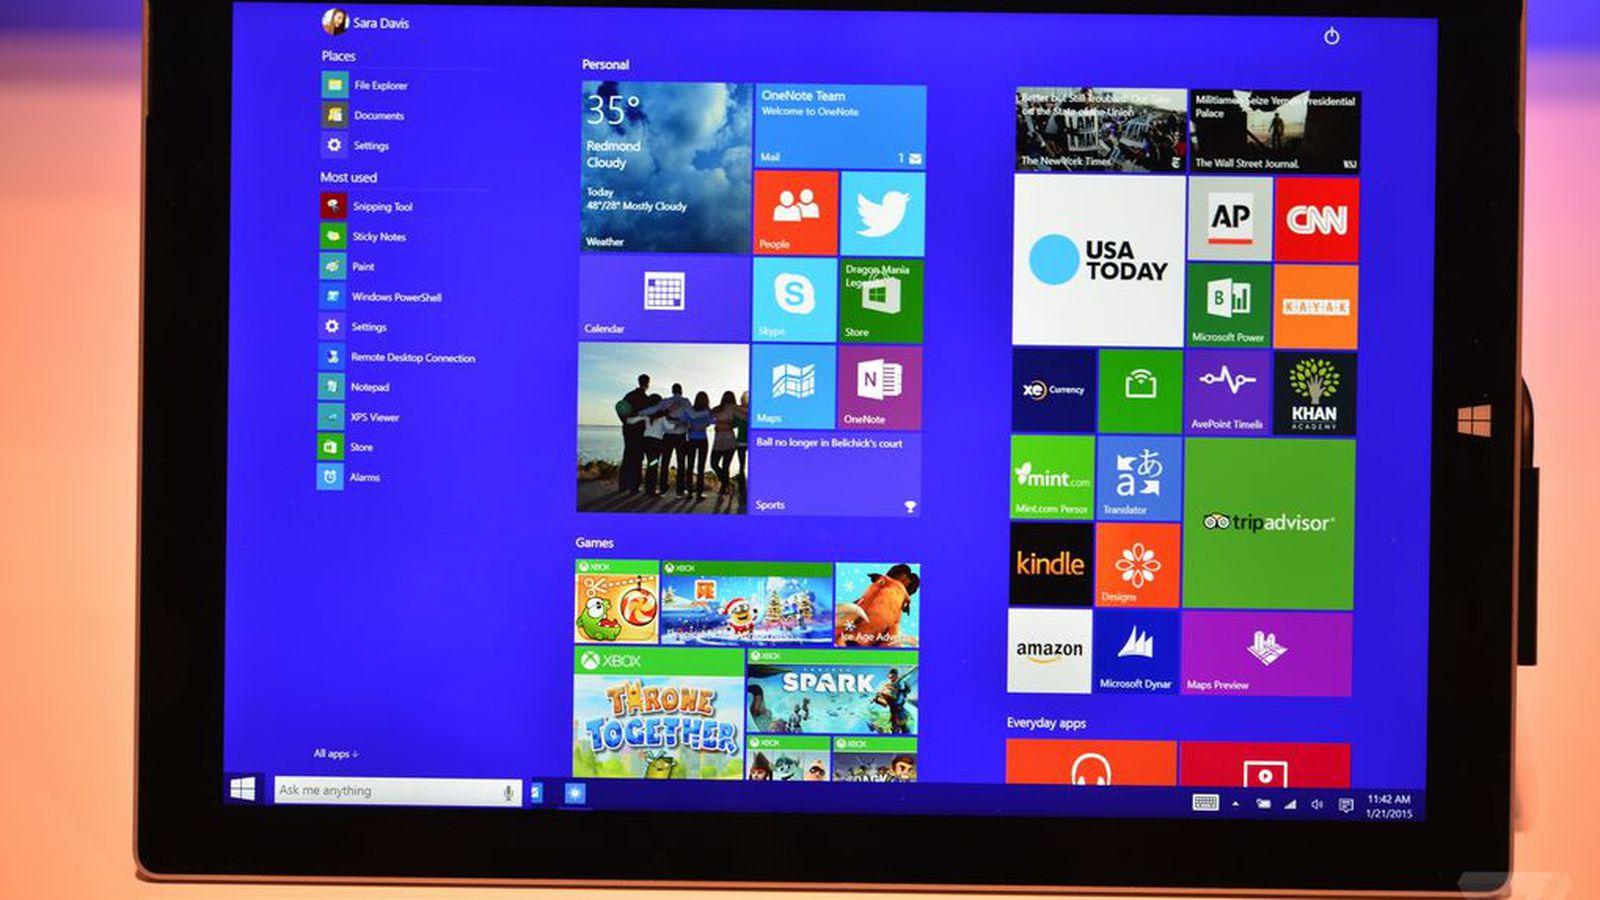 Windows 10's New Music App Looks Like Microsoft's Version